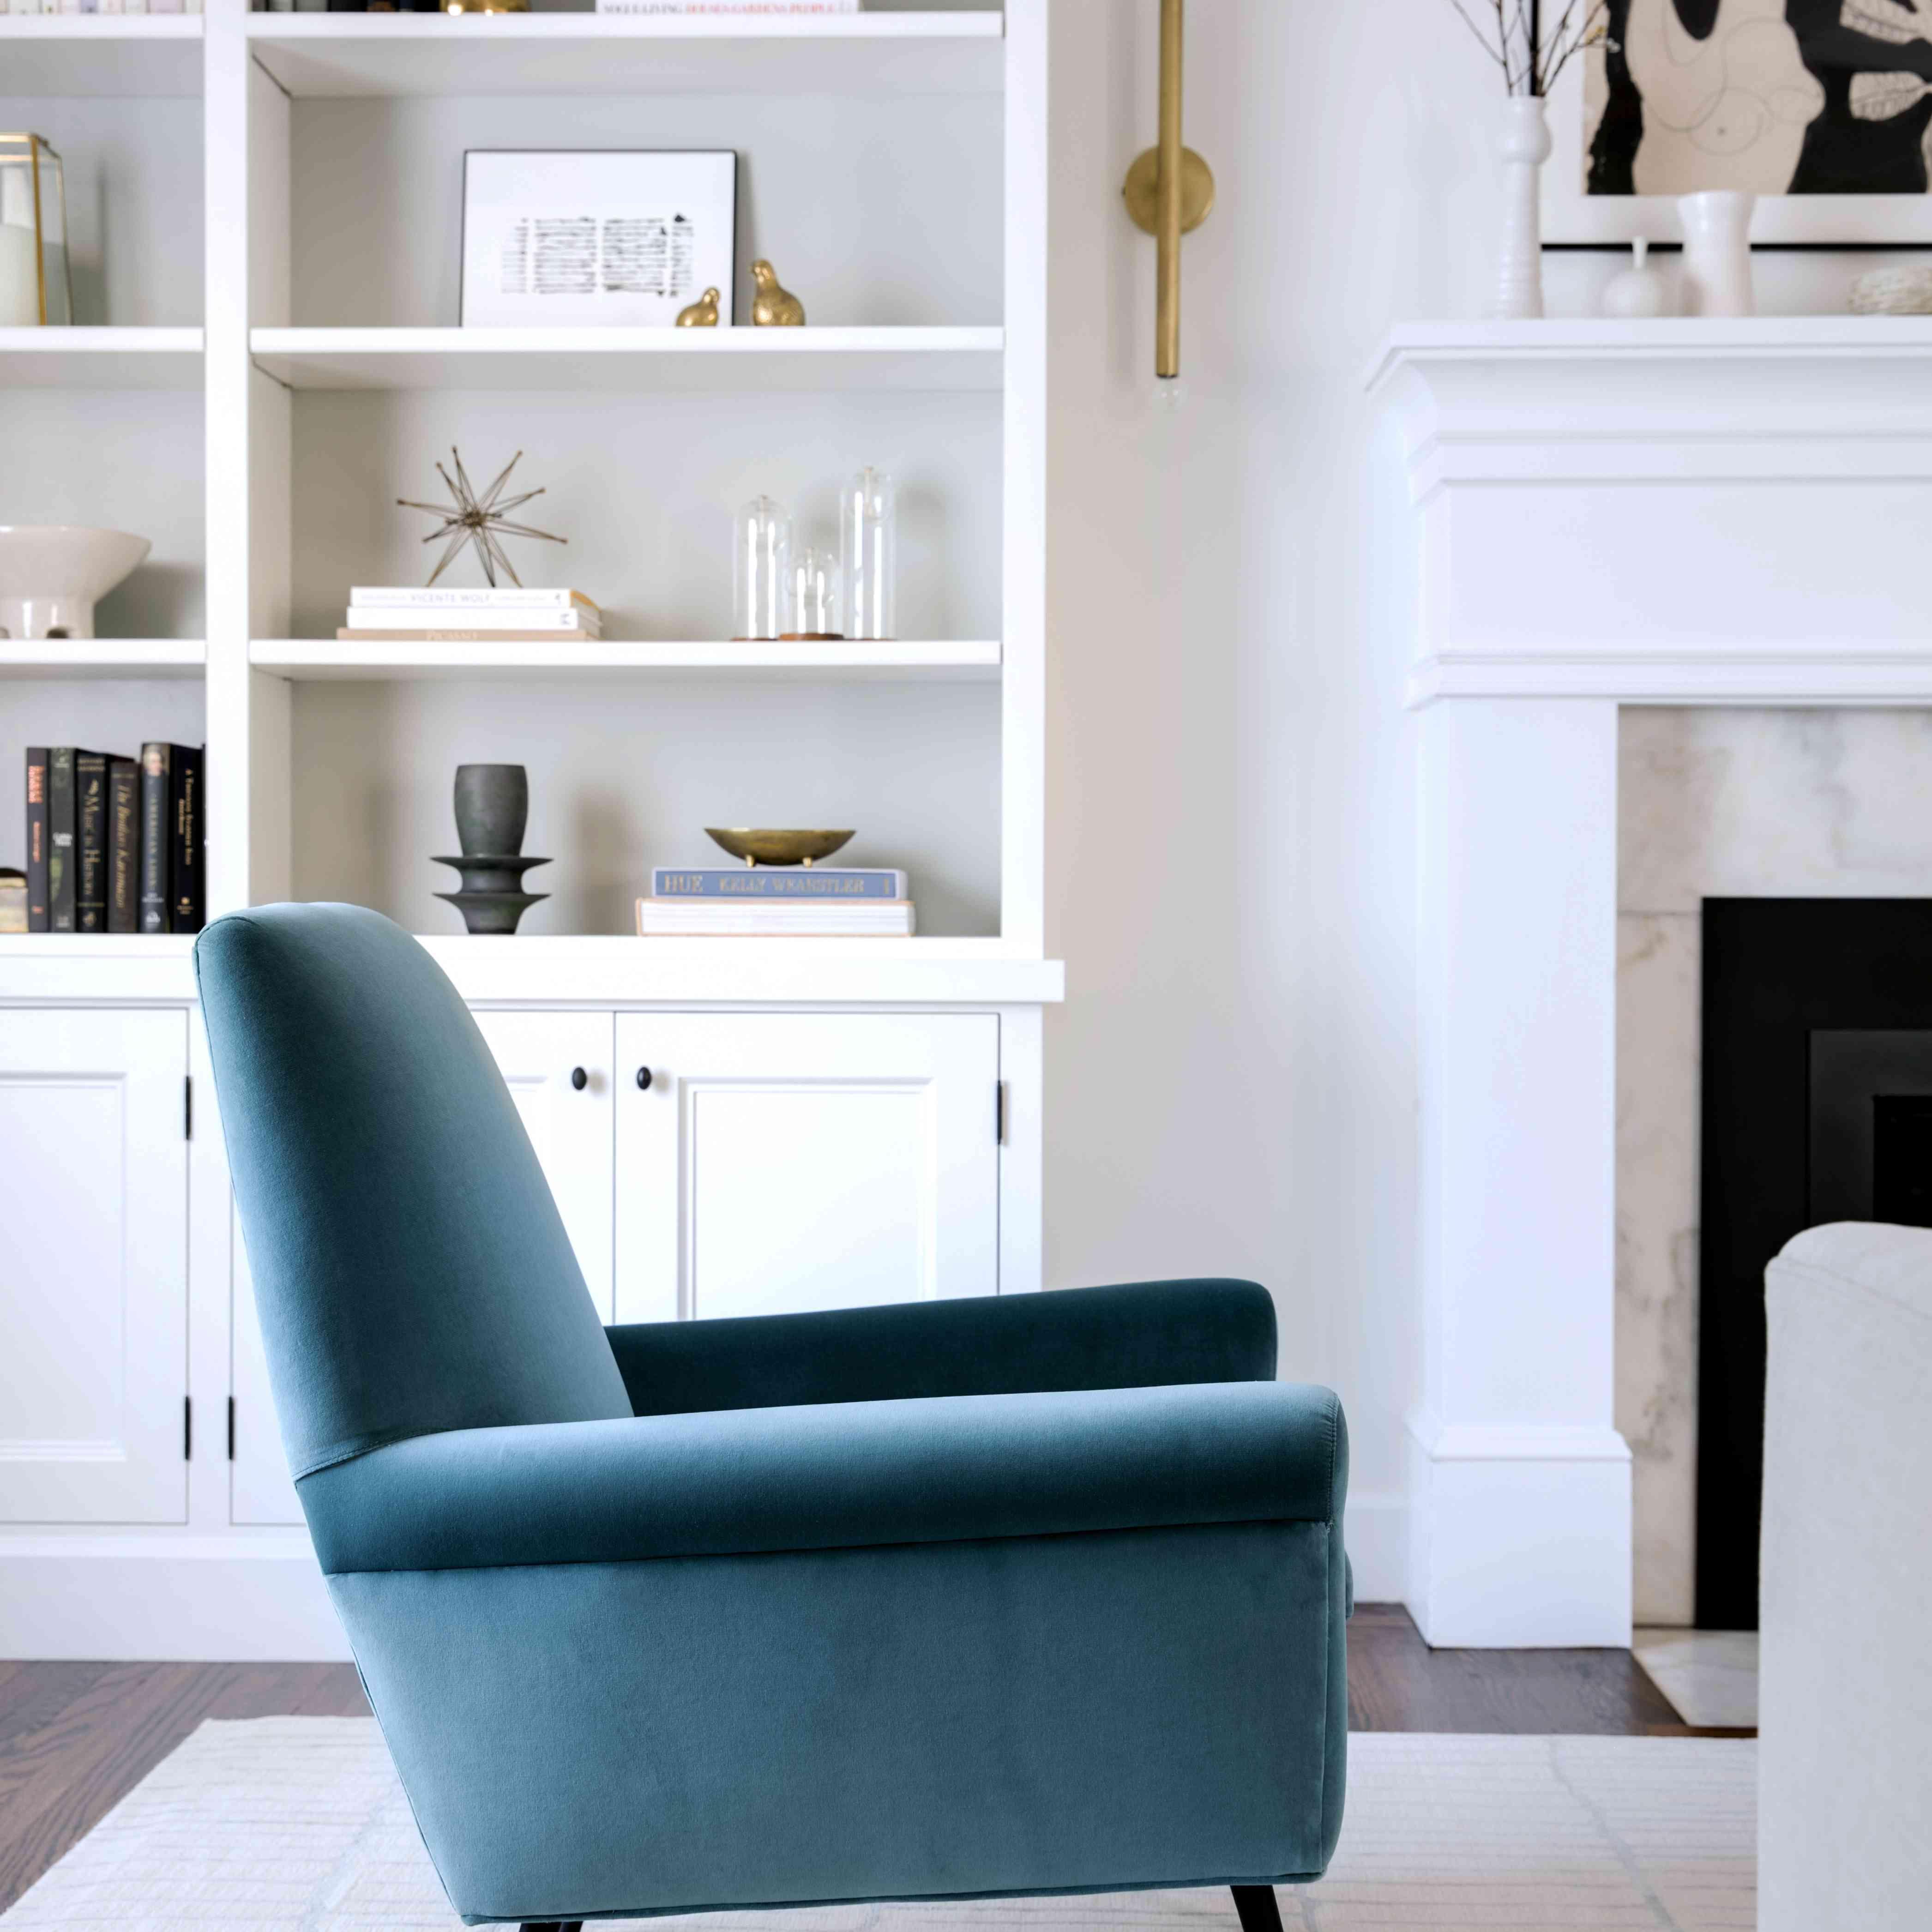 Living area from designer Jennifer Jones features portraits